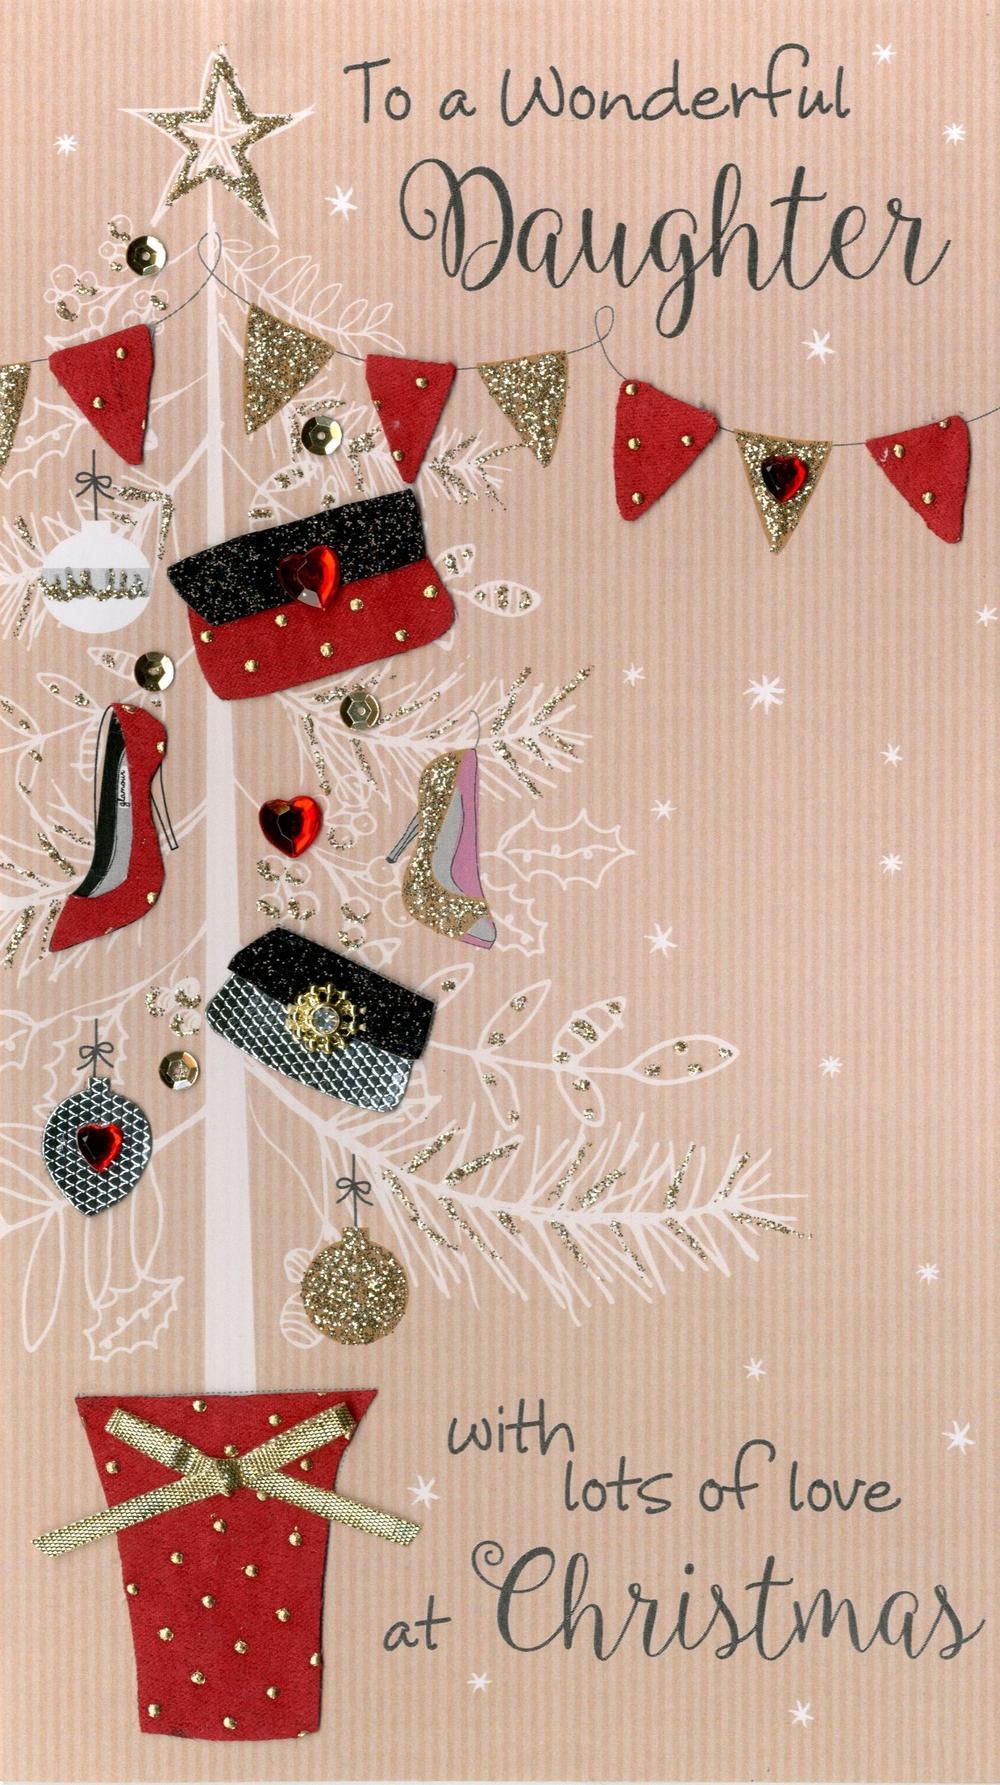 Daughter Embellished Christmas Card